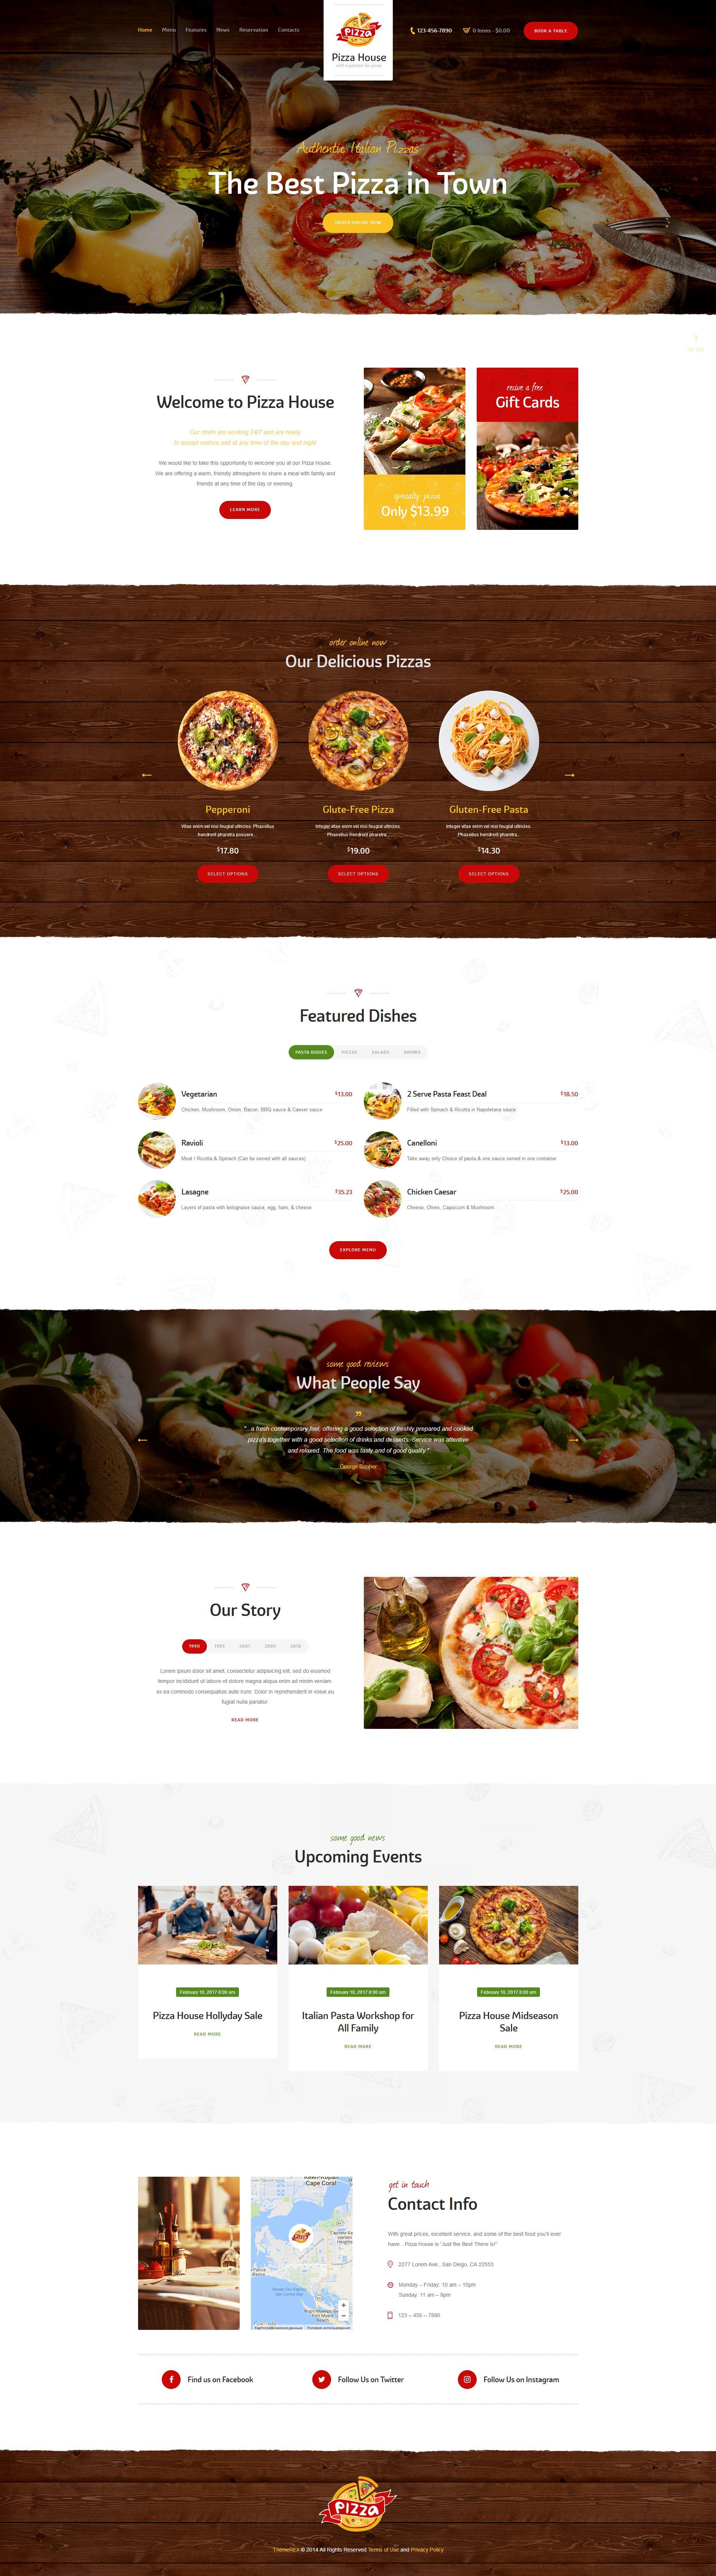 #Pizza lovers will like this stylish #WordPress theme